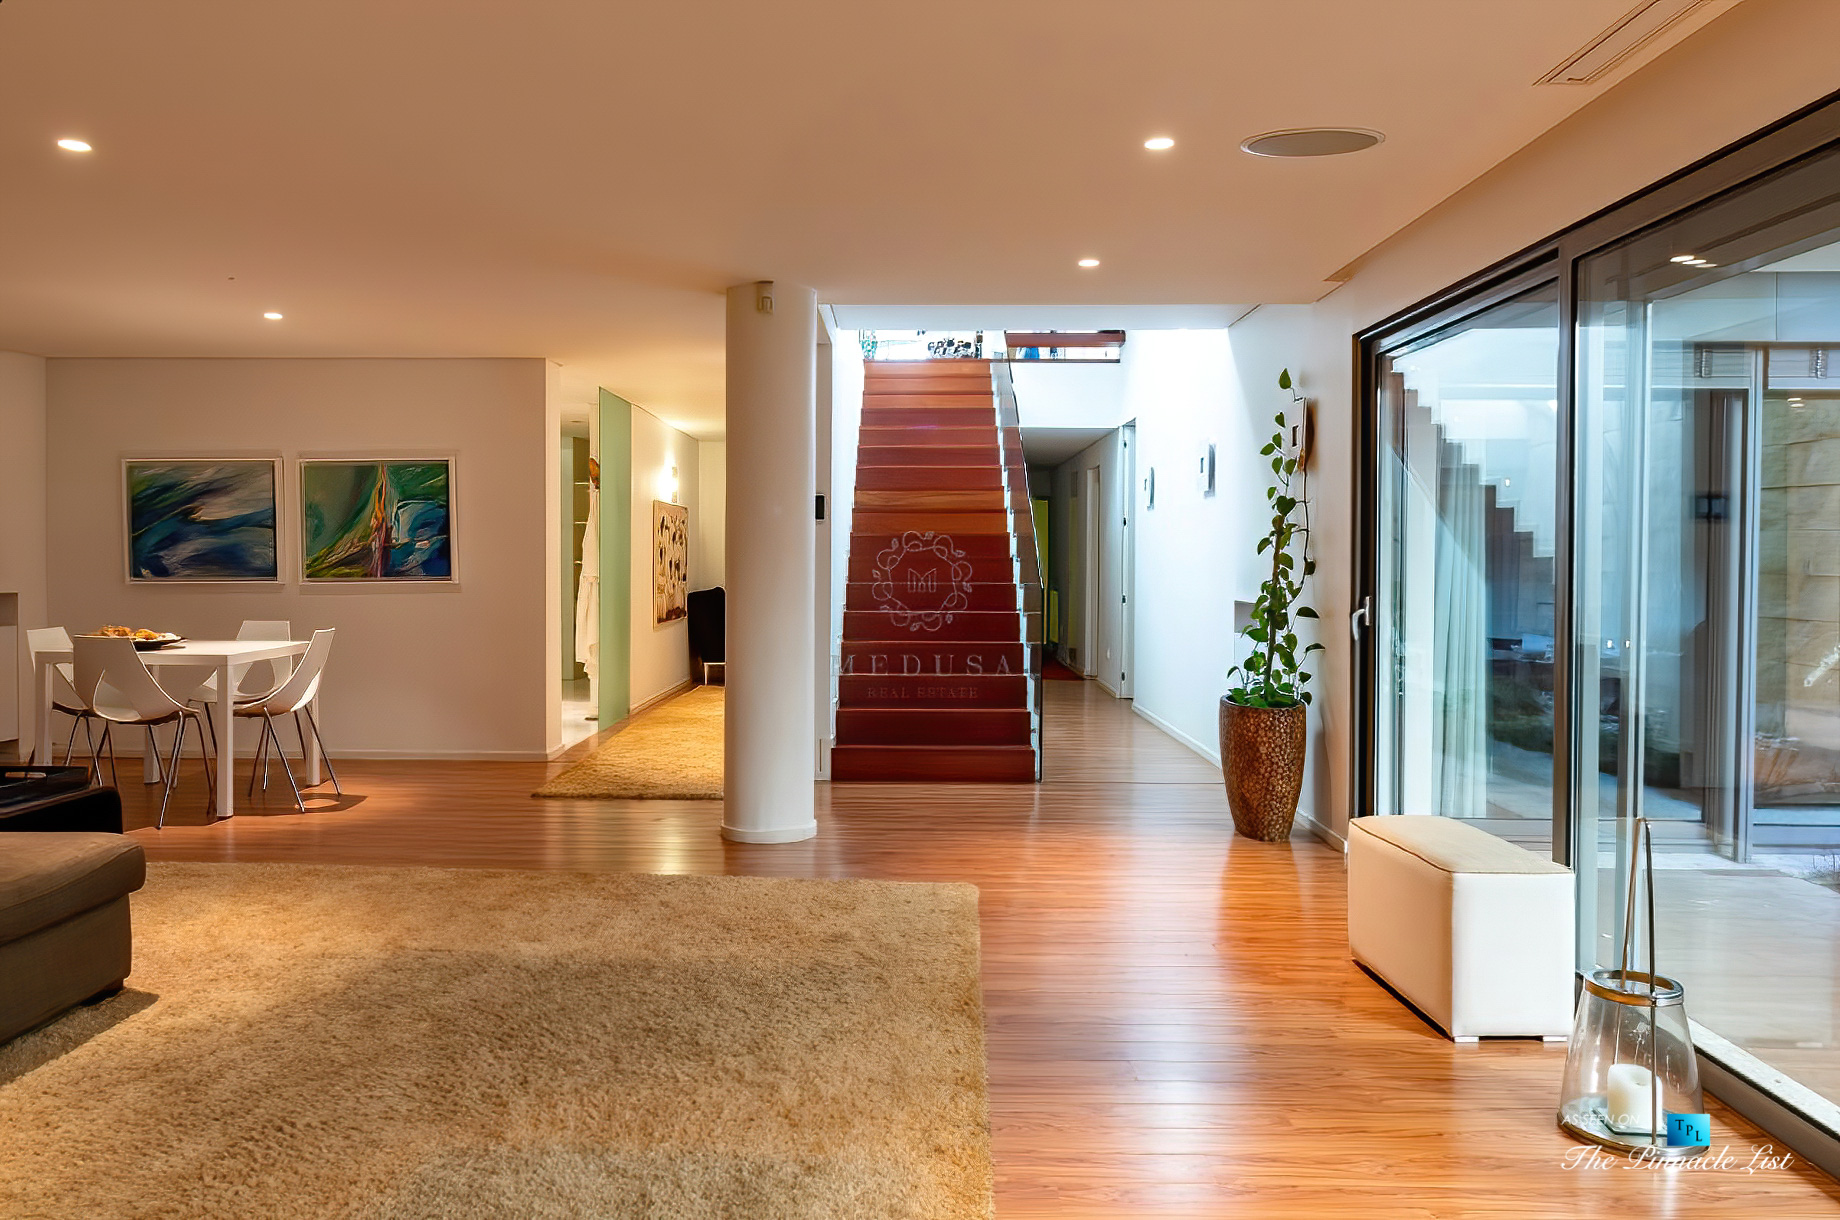 Francelos Beach Luxury T5 Villa - Porto, Portugal - Lower Level Stairs - Luxury Real Estate – Modern Home